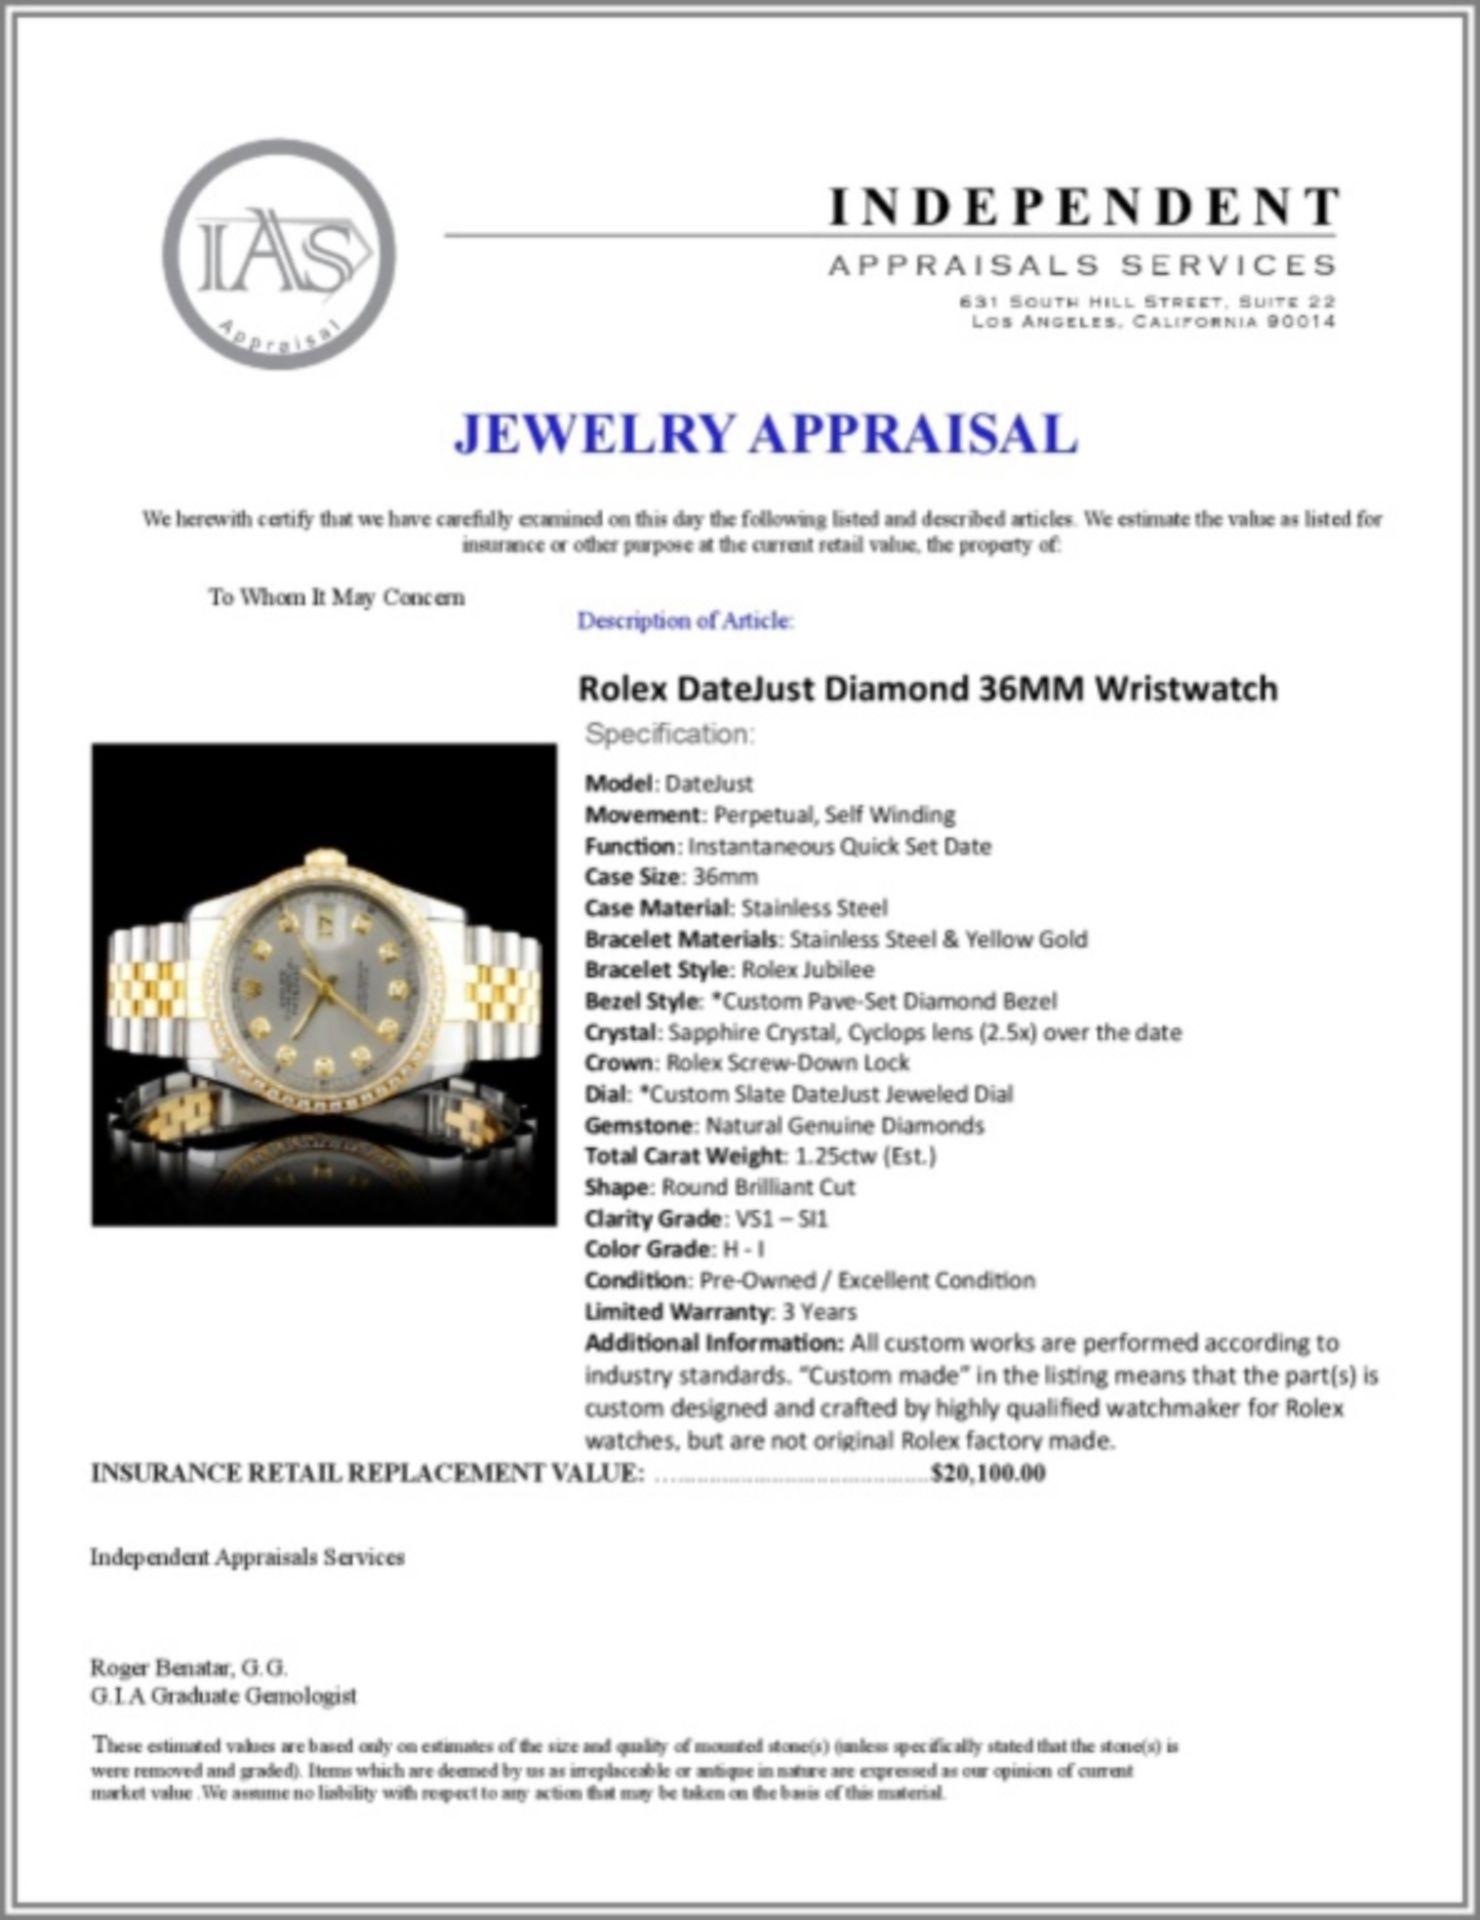 Rolex DateJust Diamond 36MM Wristwatch - Image 5 of 6